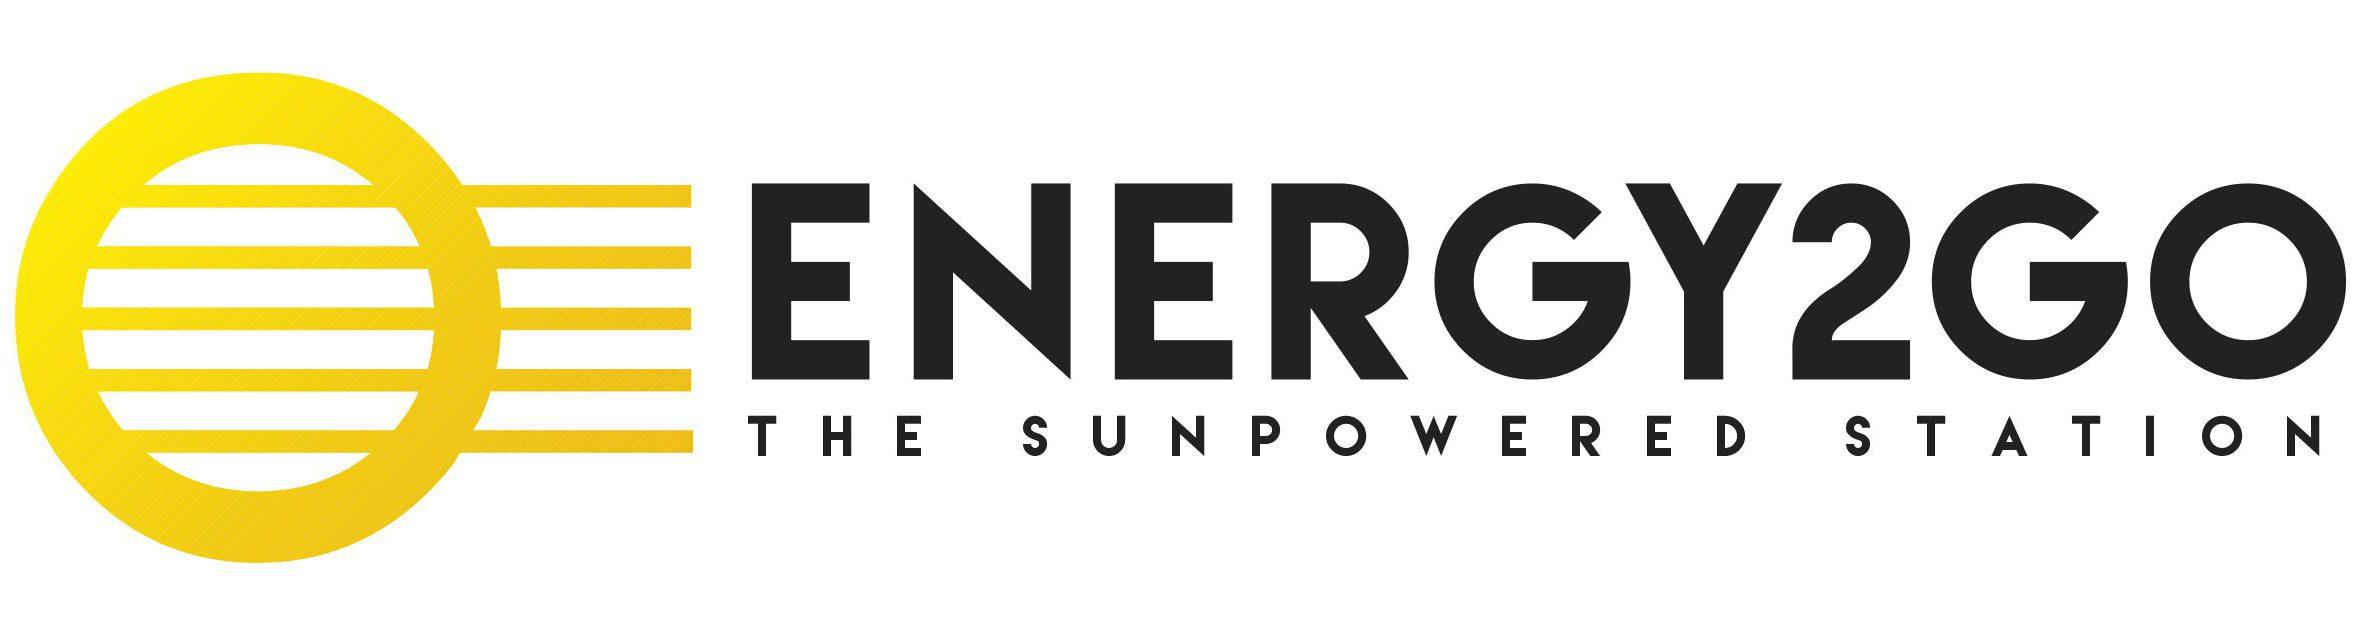 Solar energy recharge